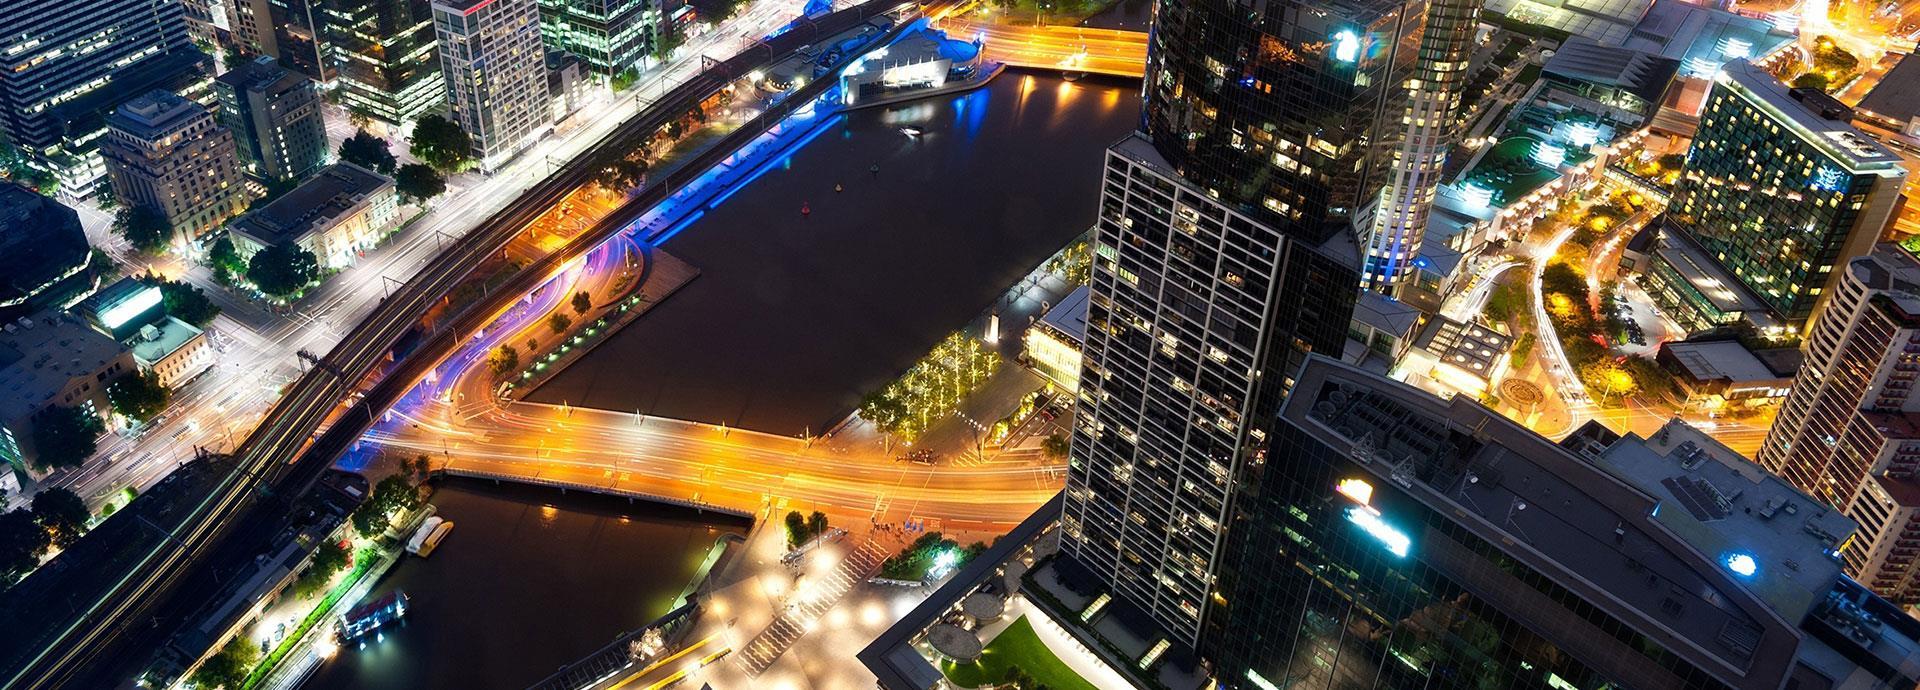 Value of Smart Power Generation for utilities in Australia